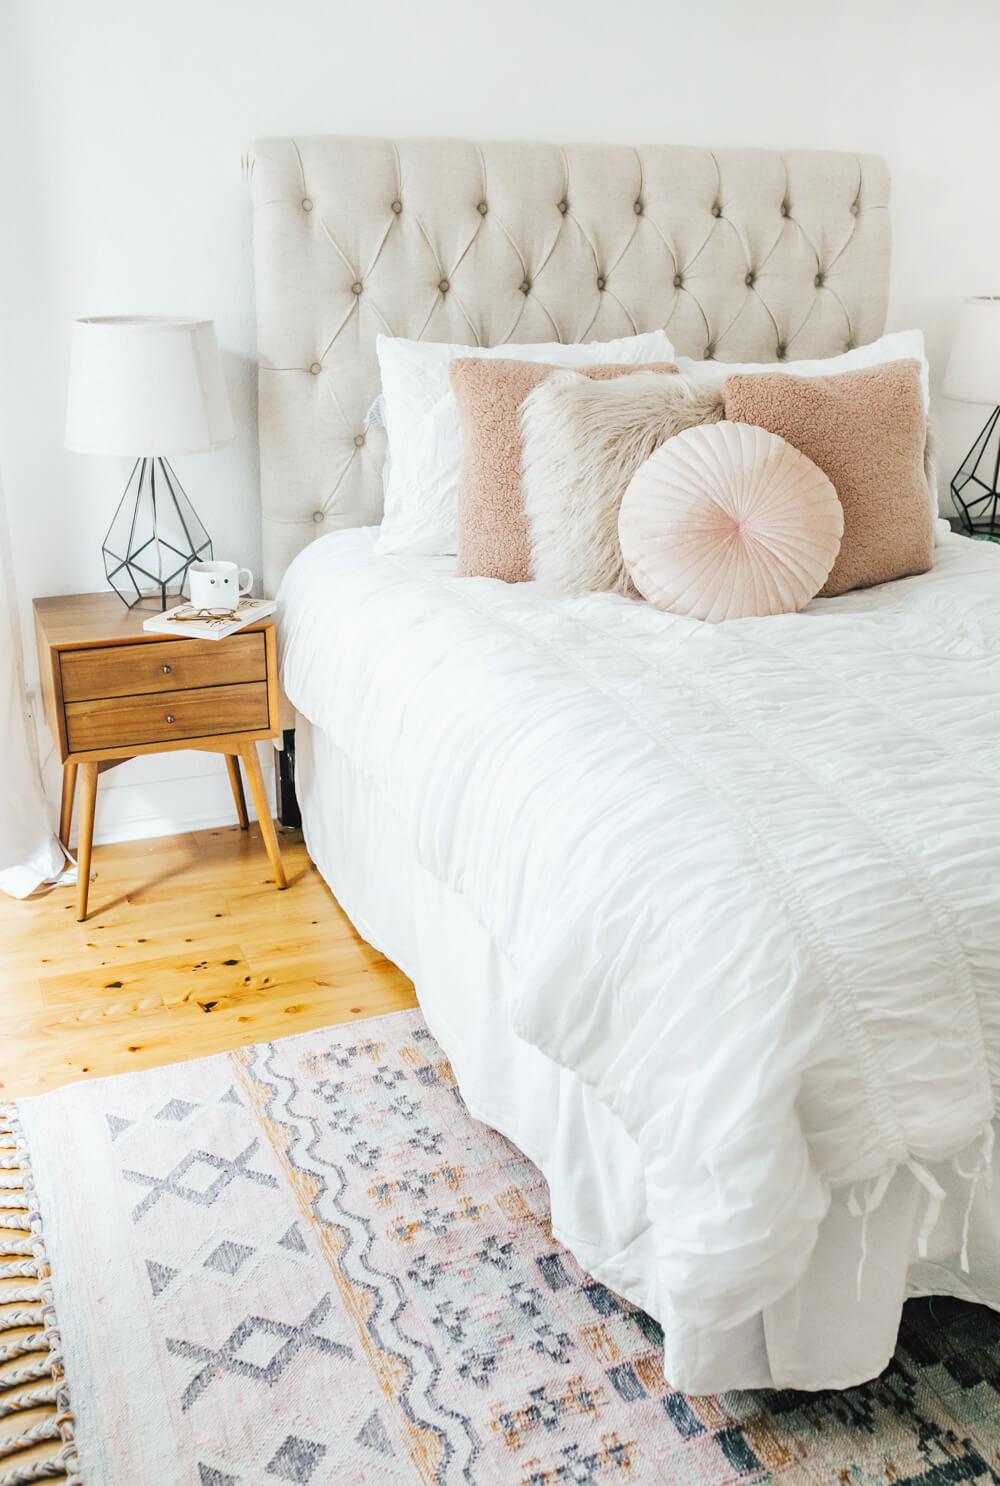 14 Best Trendy Bedroom Decor and Design Ideas for 2020 on Trendy Bedroom  id=40083